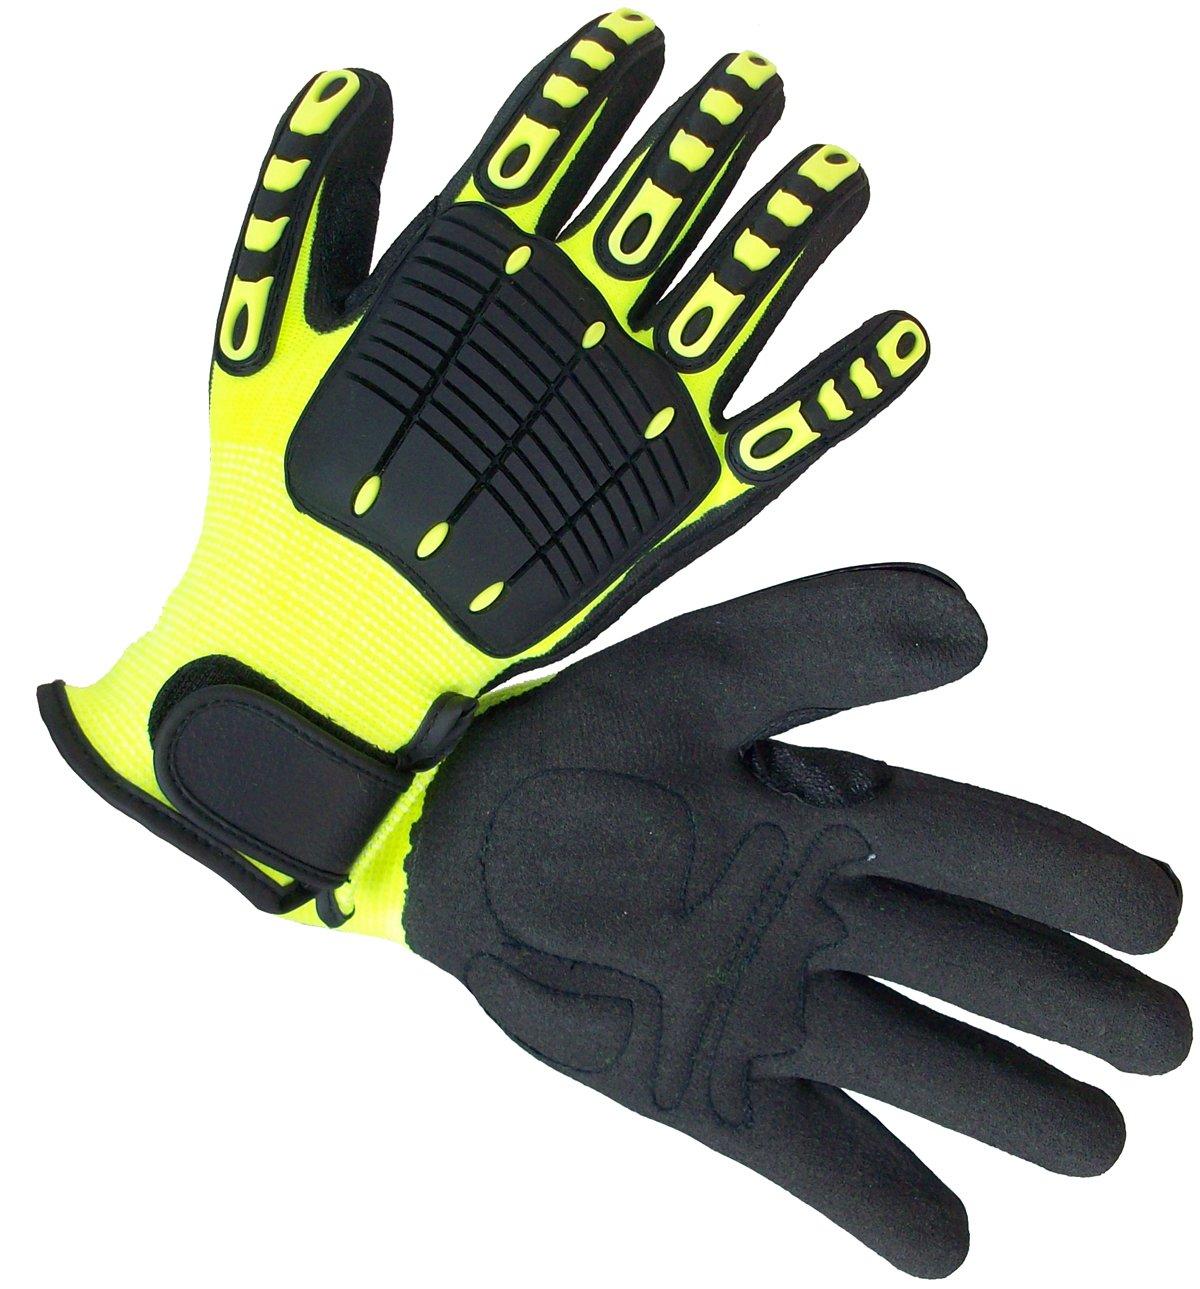 Impacto NS2800050 Anti-Impact Back Tracker Glove, Black